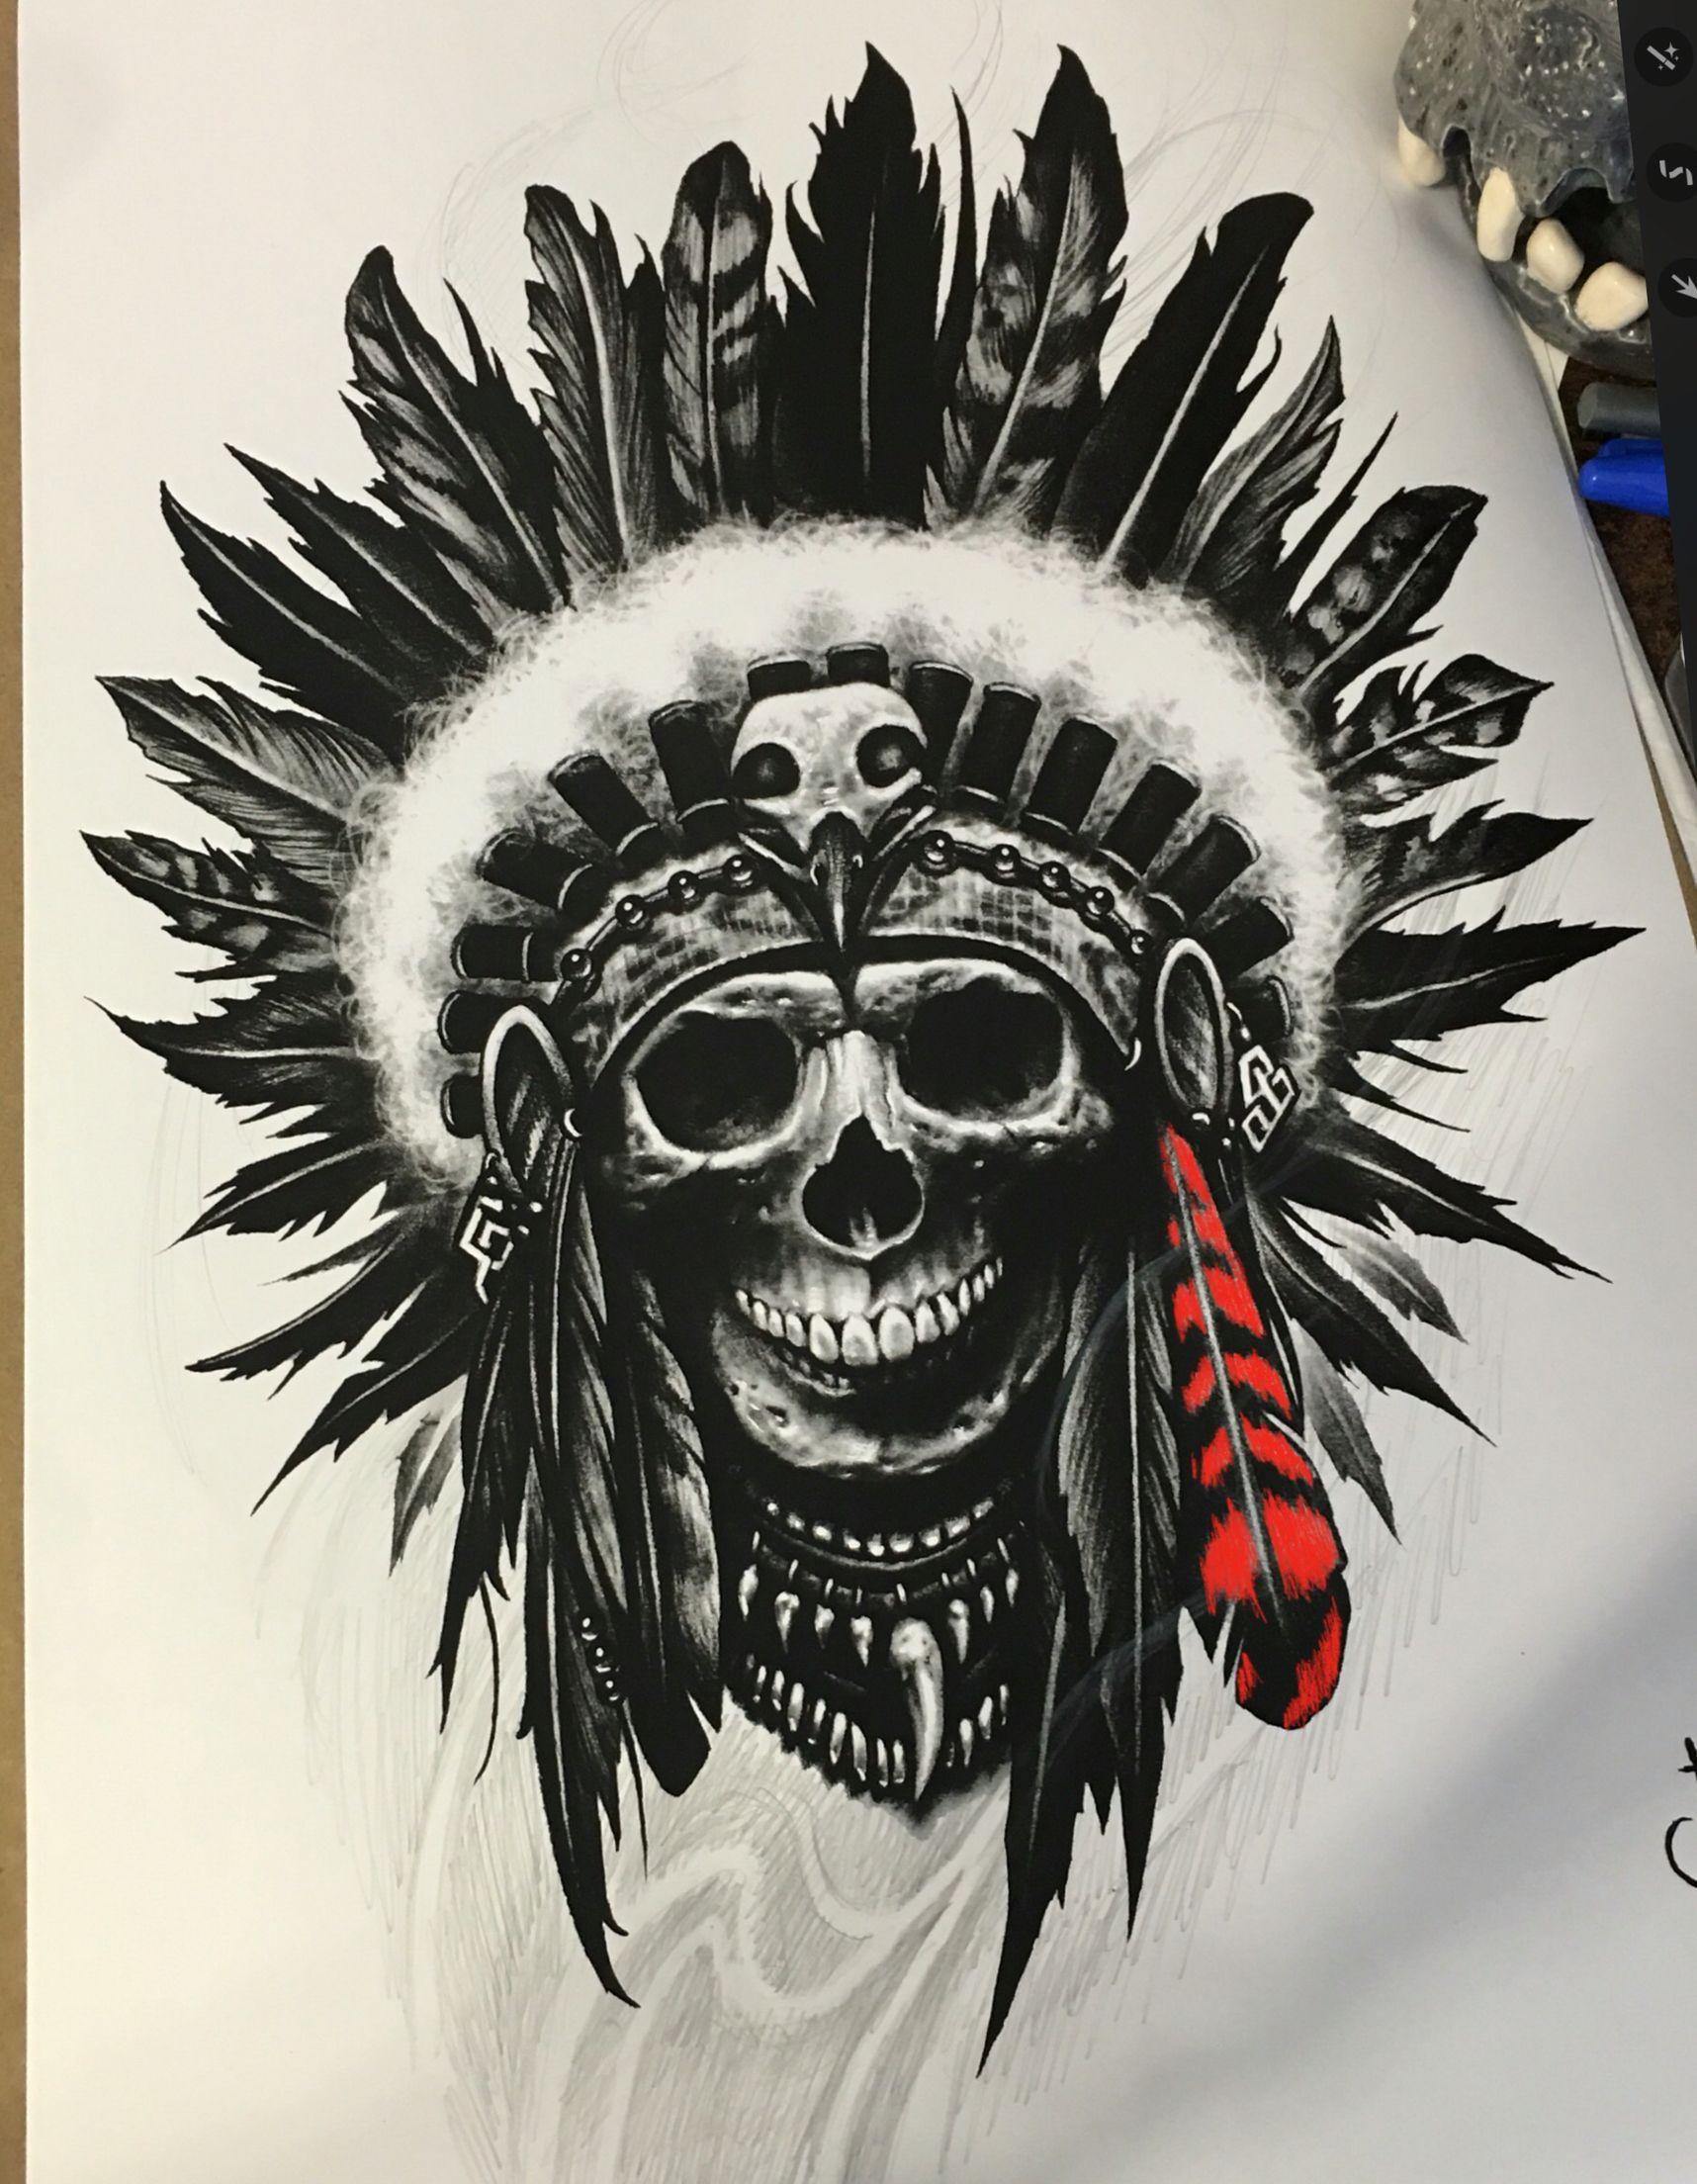 Tattoos Tattoo Indian Skull Tattoos Native Tattoos border=